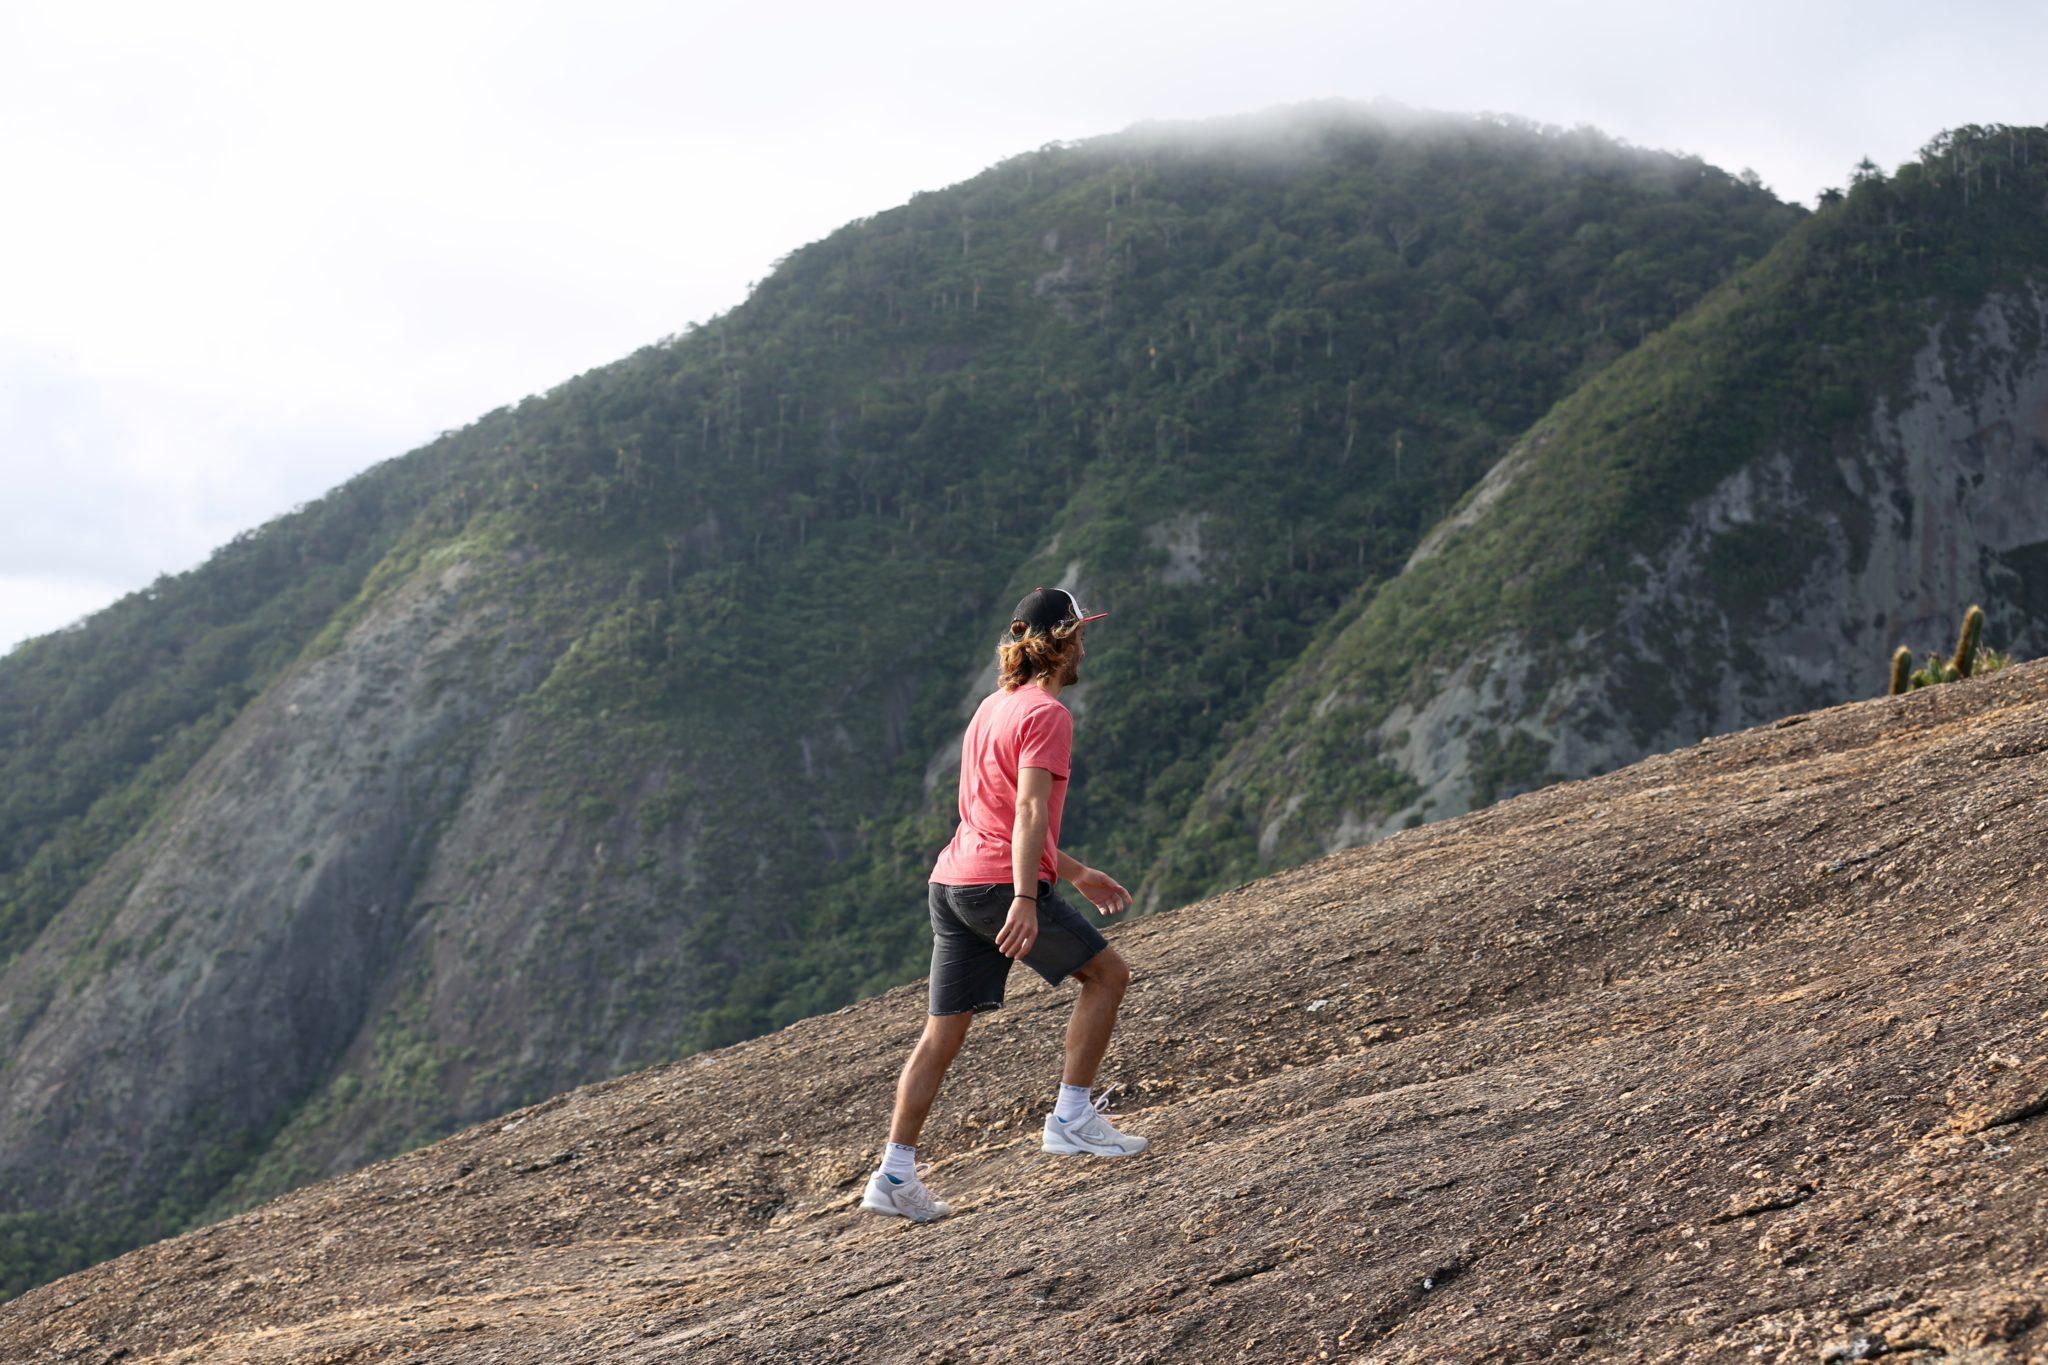 Pierre Louis Costes aproveitou o dia escalando montanha / Foto Alex Leon/APB